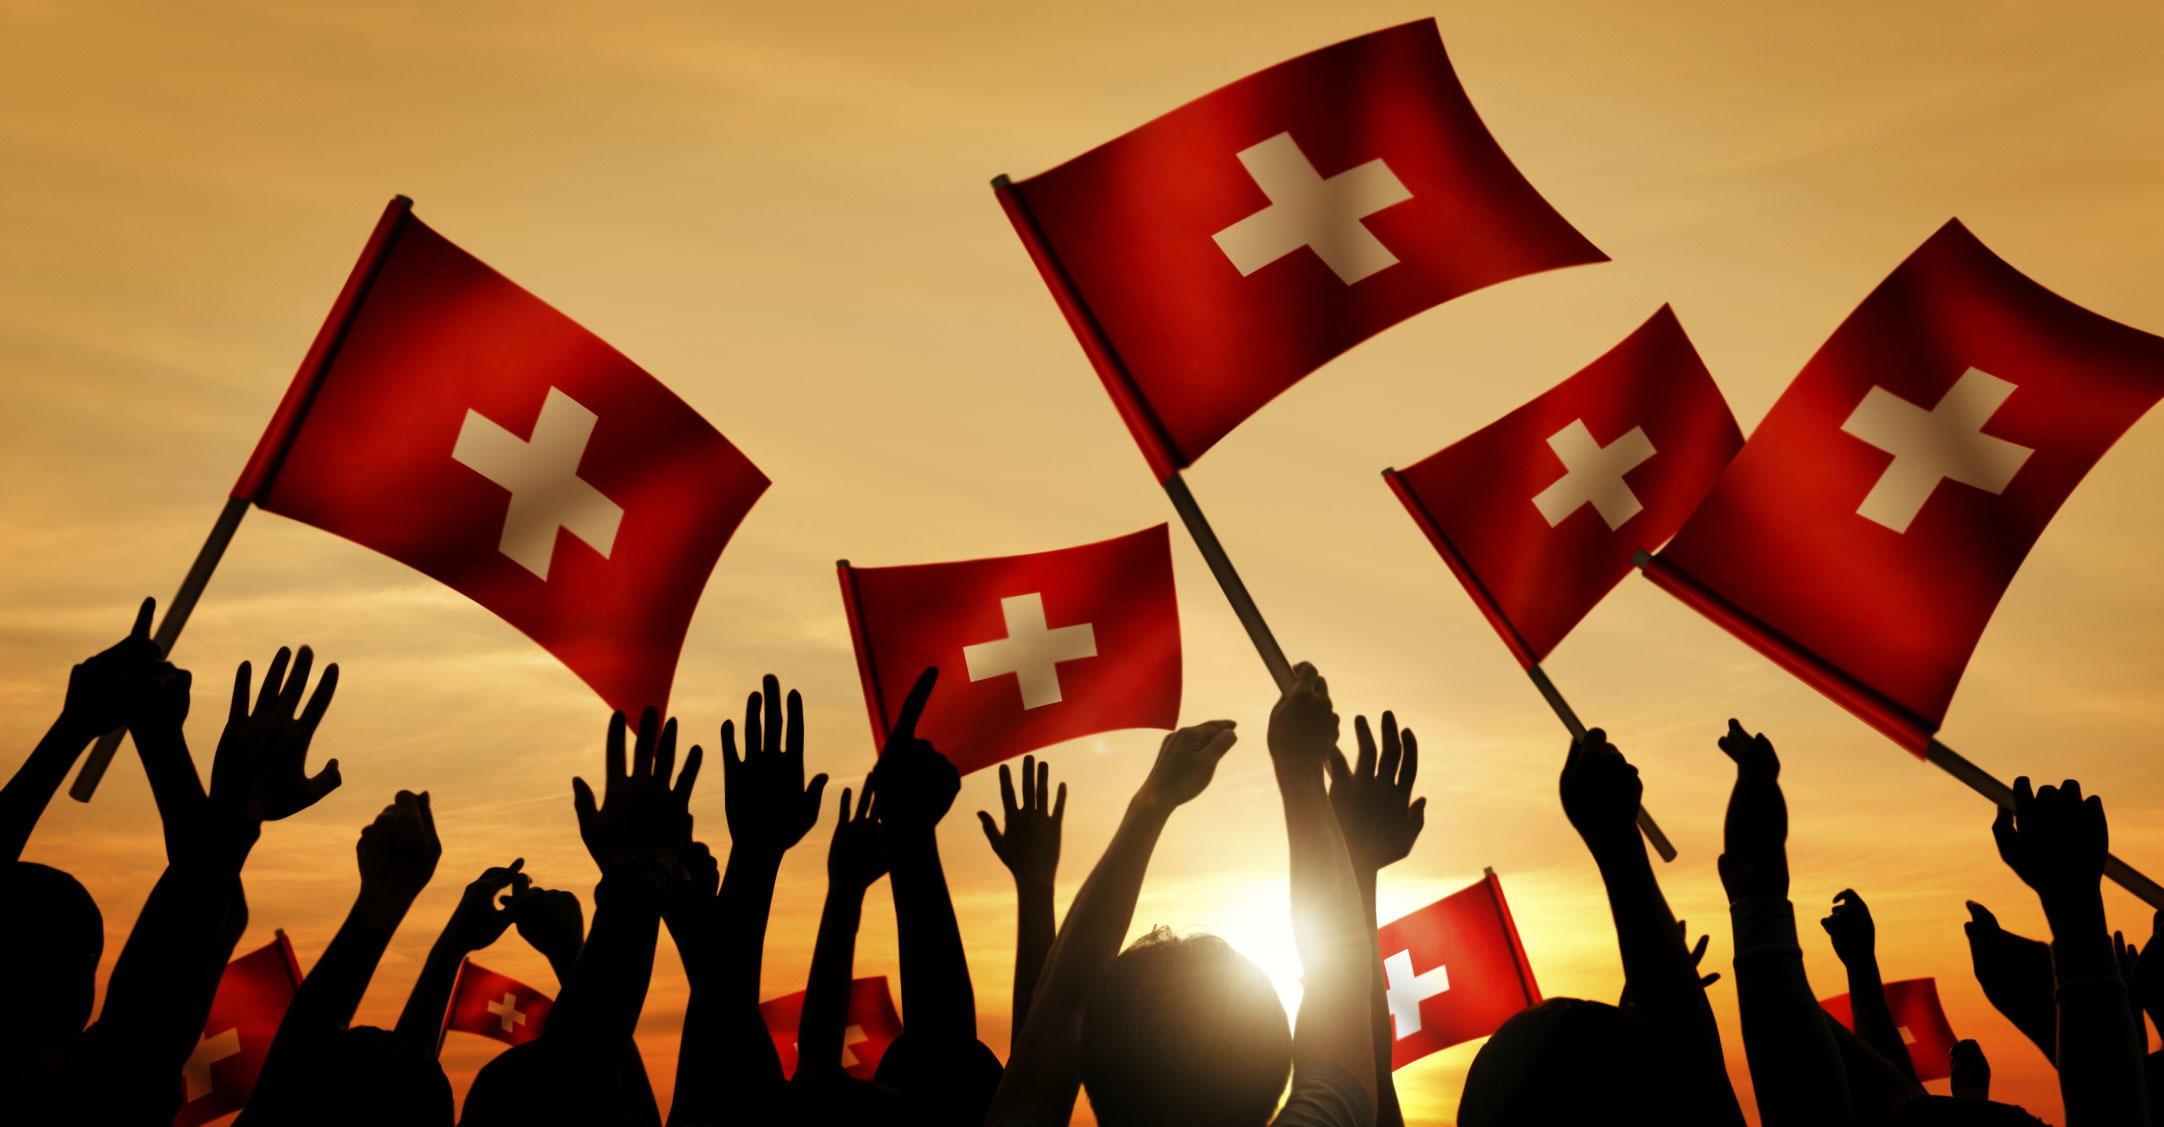 People waving Swiss flag